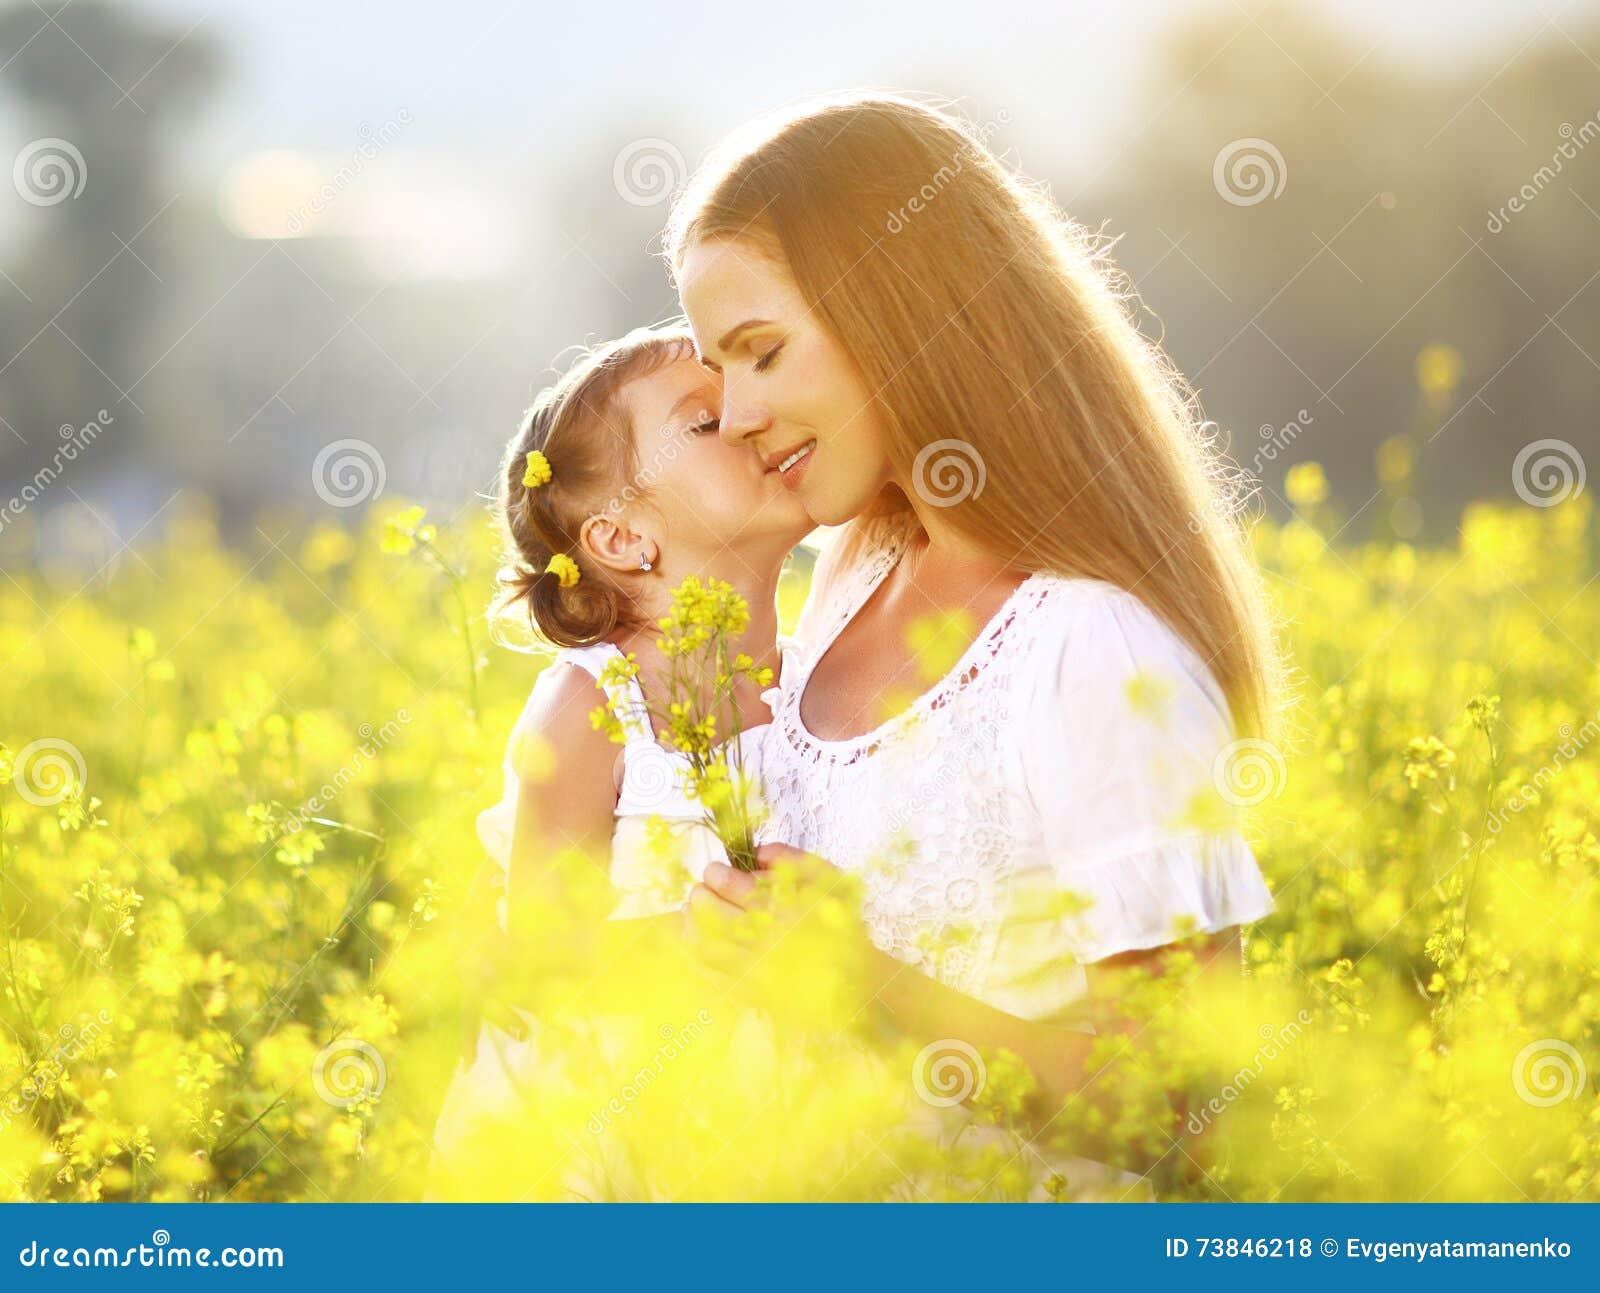 Familia feliz el verano abrazo de la hija del niño de la niña y k